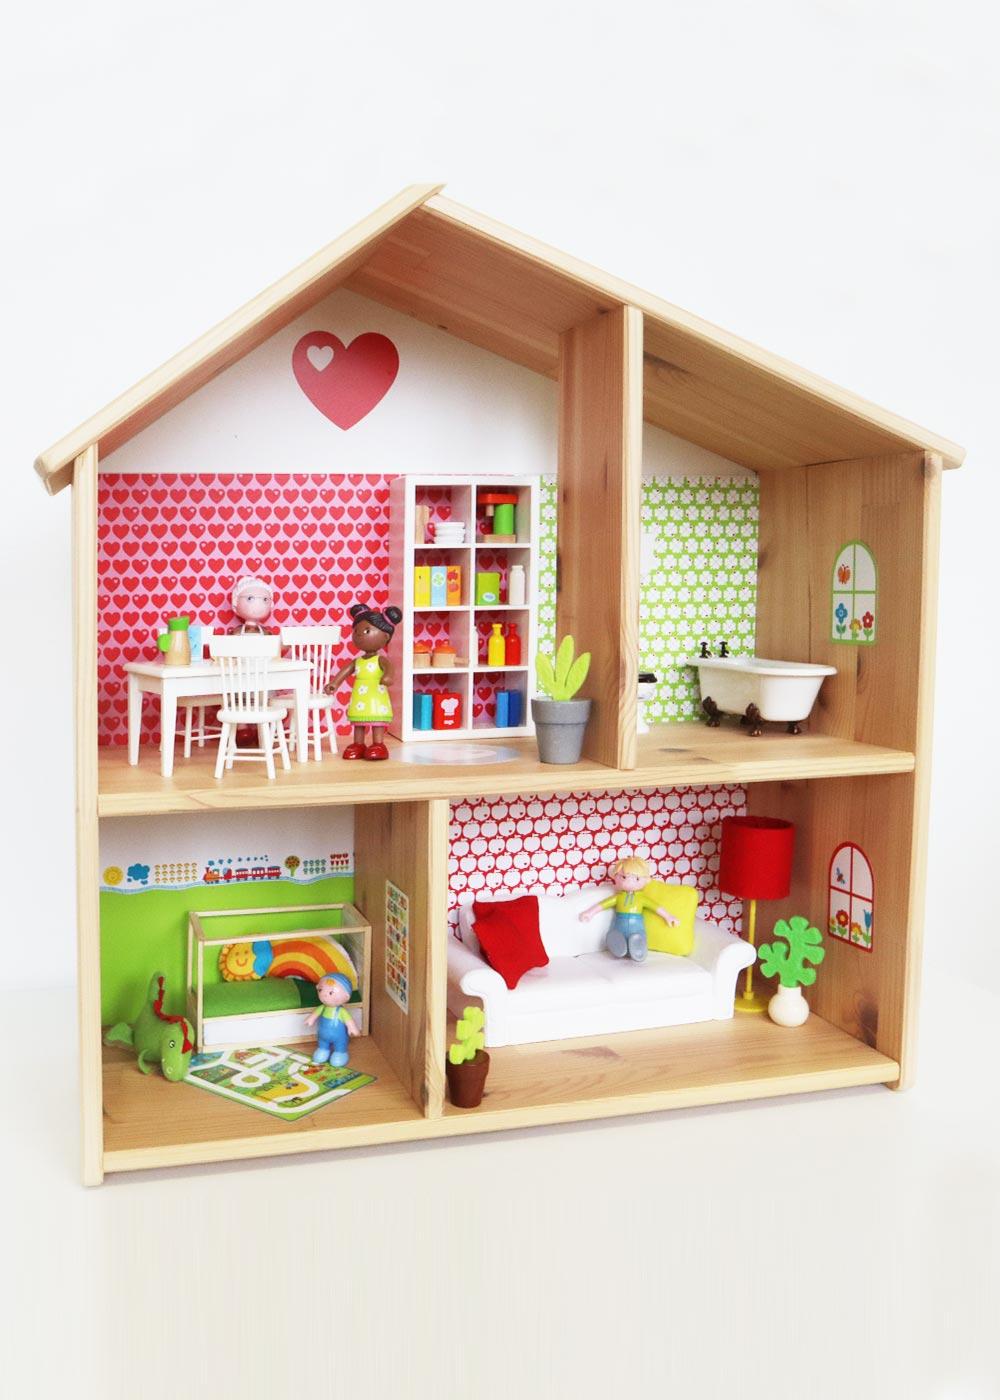 Ikea Flisat Puppenhaus Tapete ByGraziela rot grün Komplettansicht schräg